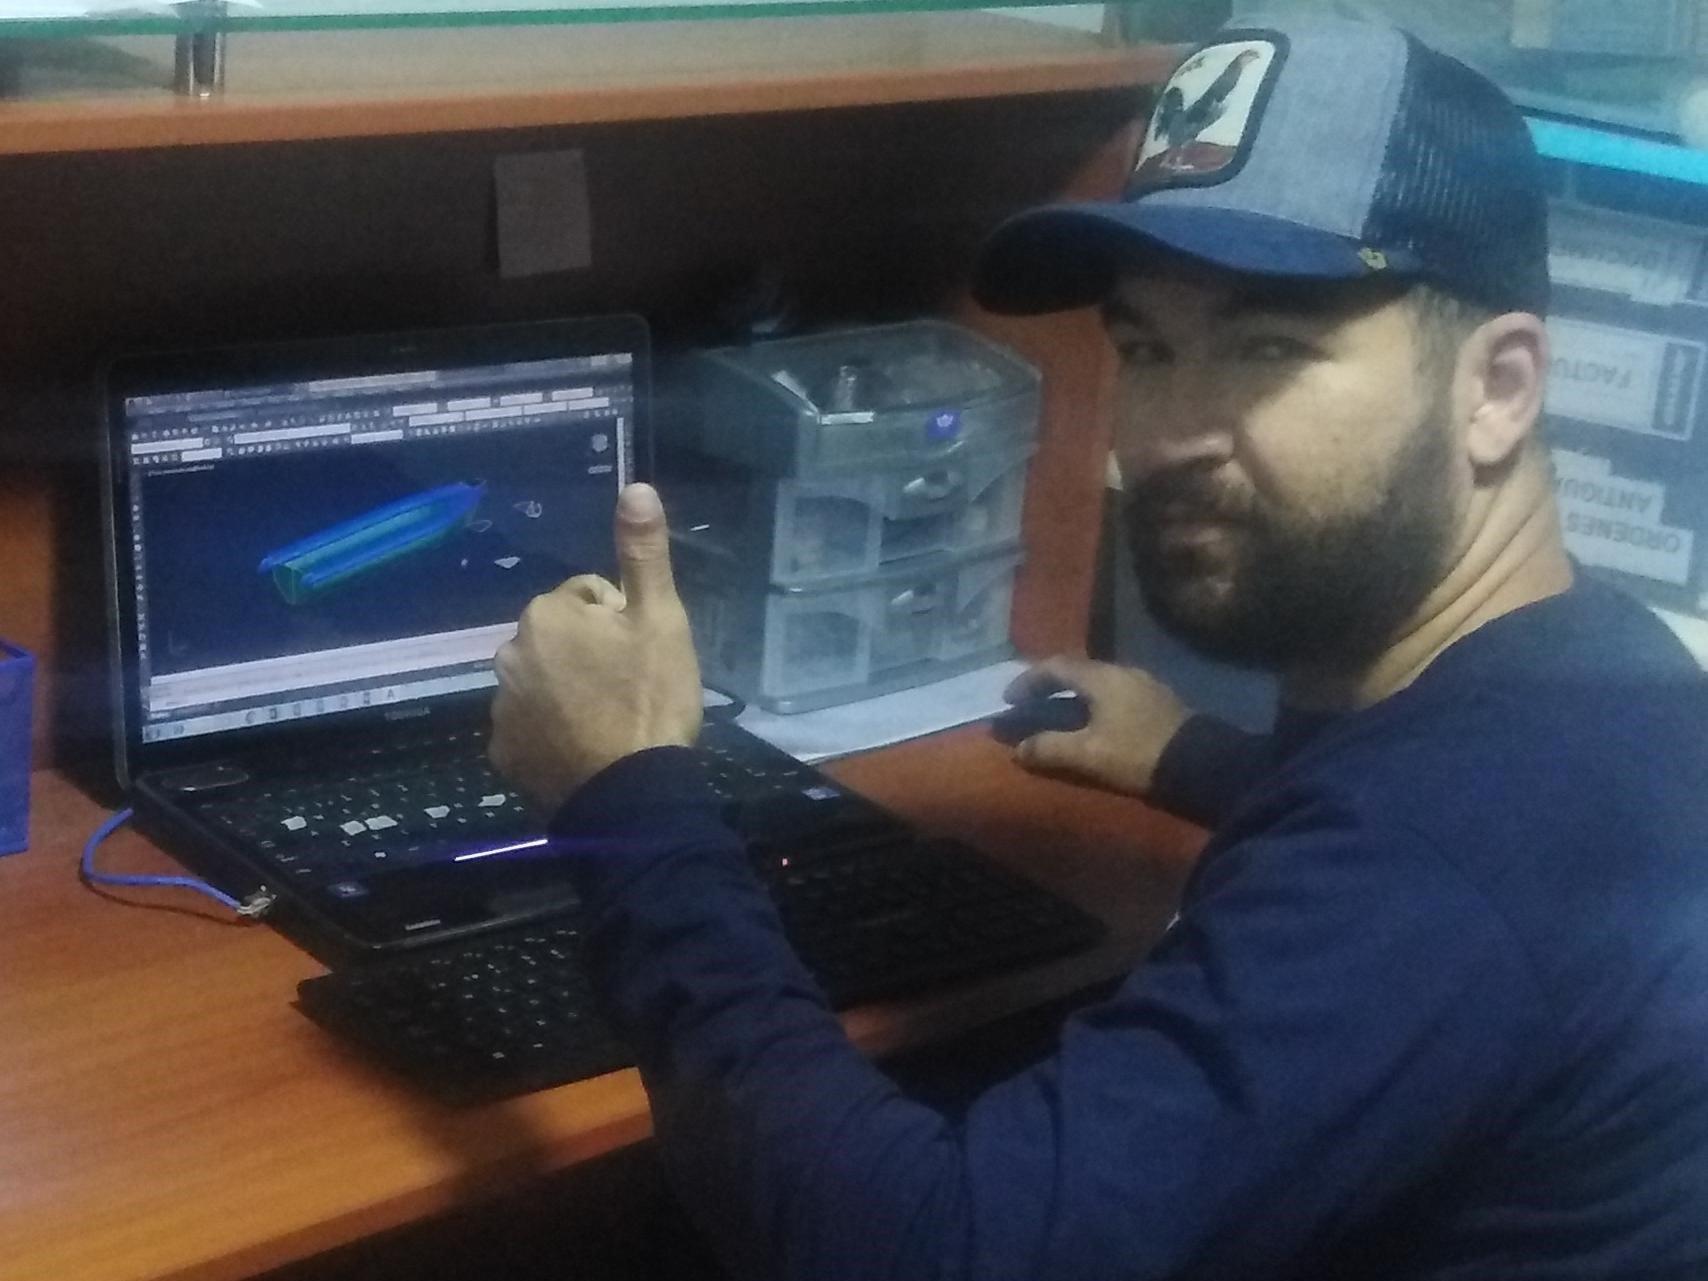 24 marine Smart Marine Cargo IHM Surveys Surveyors Hazmat Consultant Panama Canal Condition Prepurchase Precharter Surveys